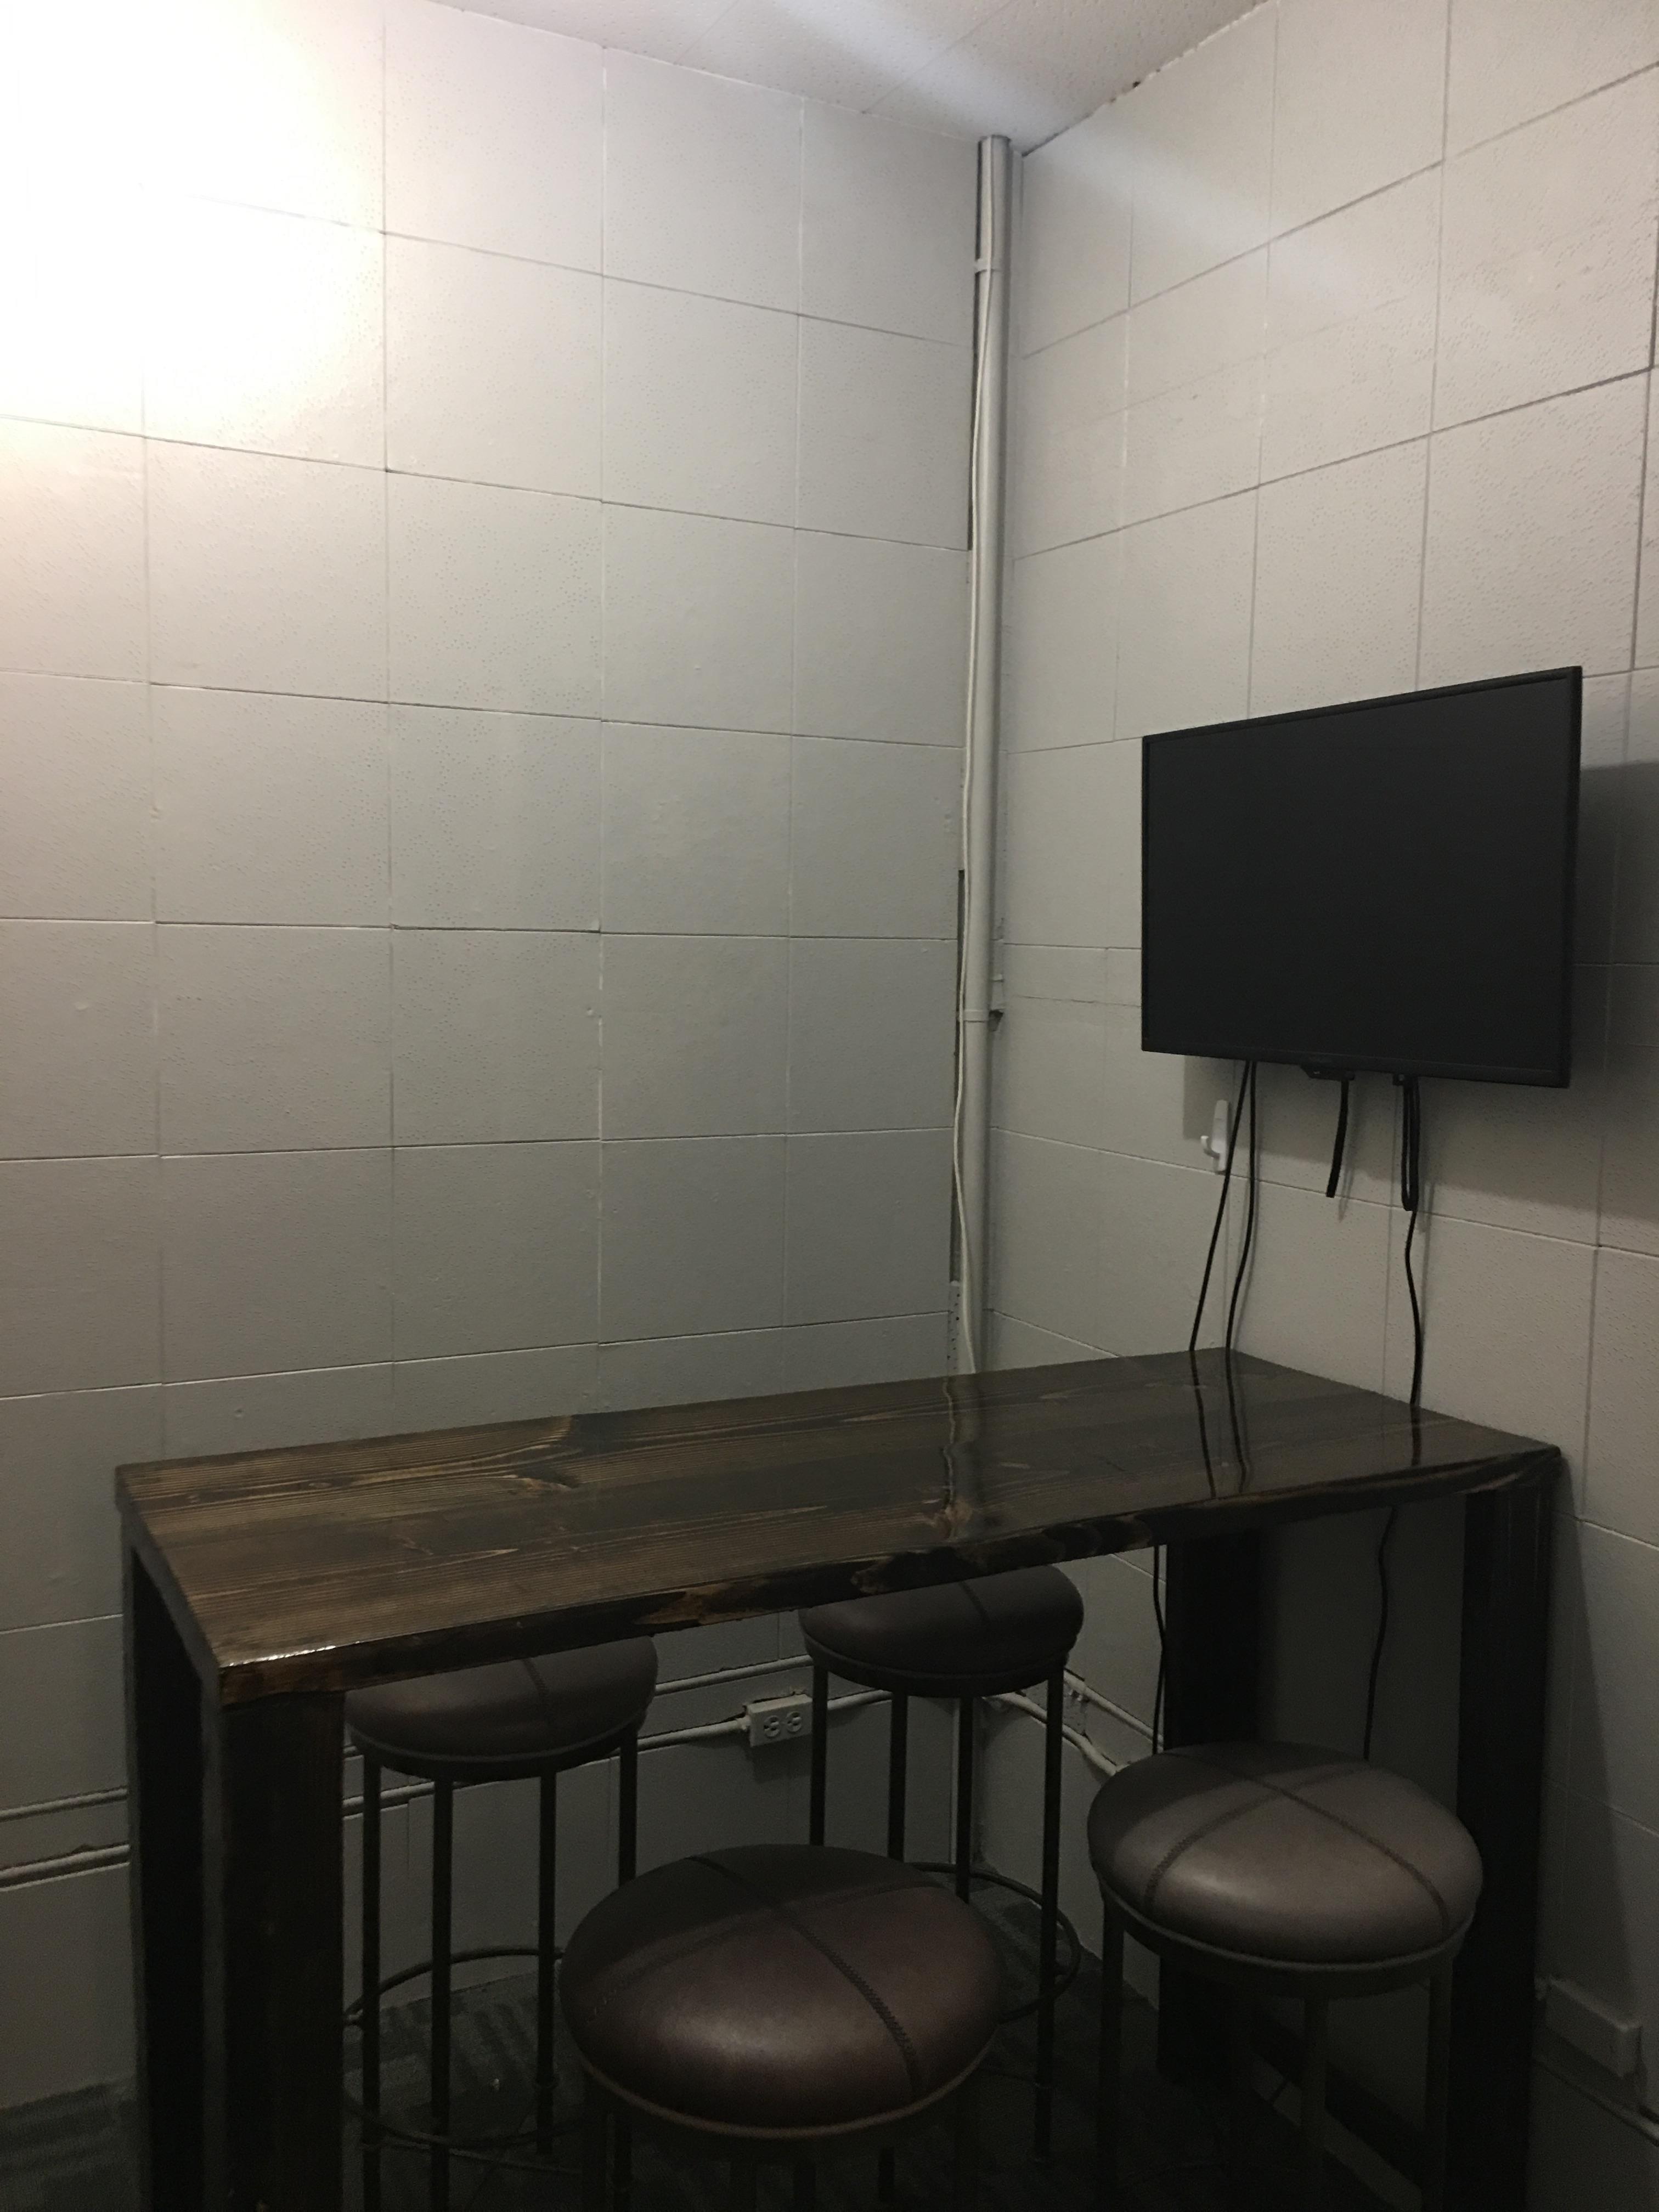 FOCUS Innovation Studio - Catherine Opie Conference Room